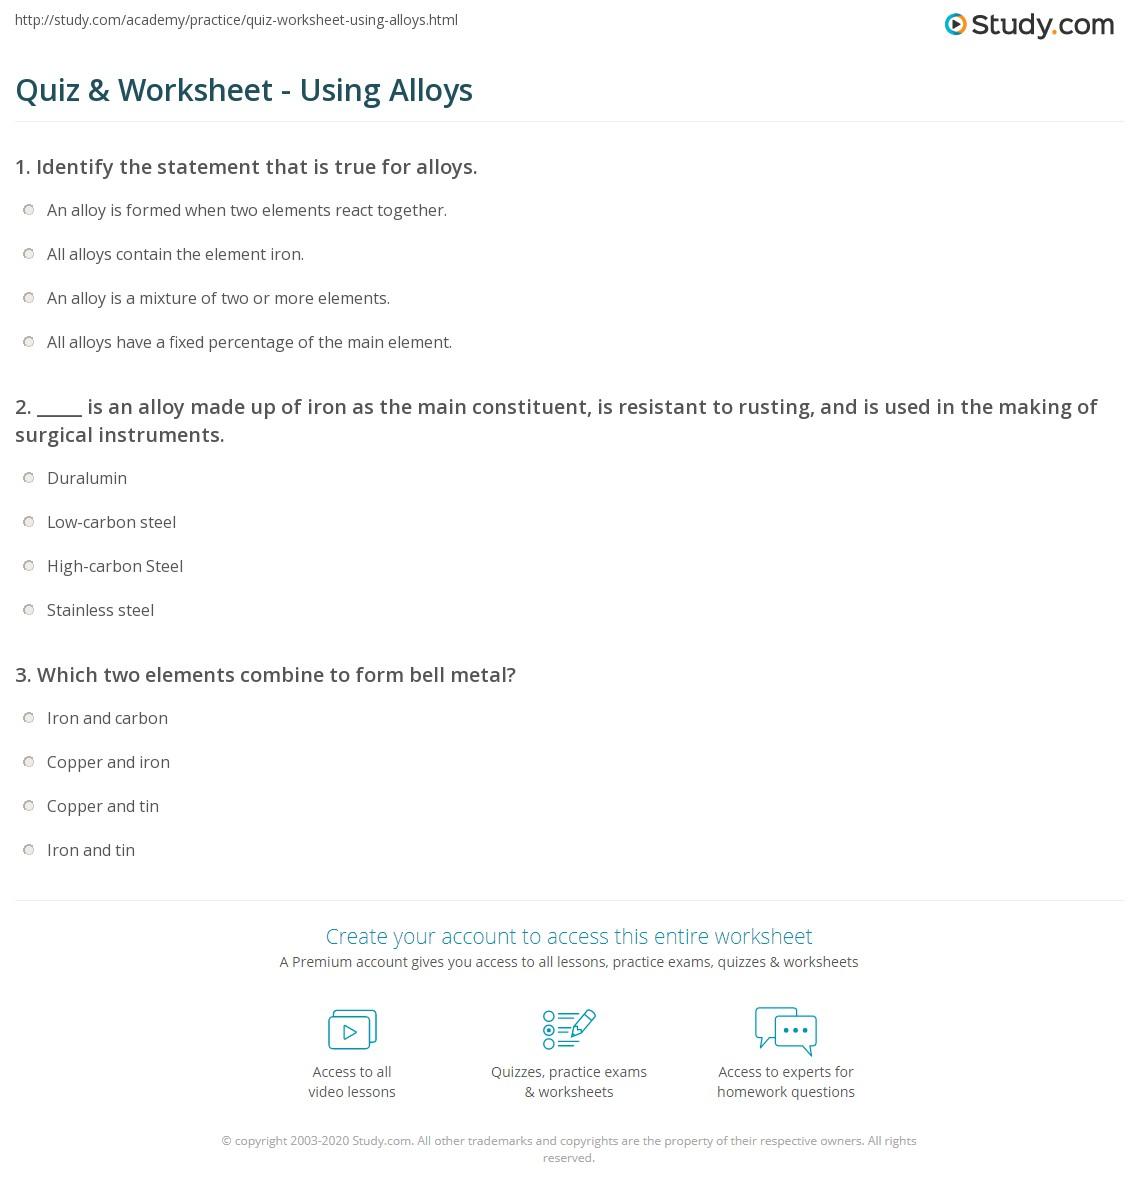 Quiz & Worksheet - Using Alloys | Study.com